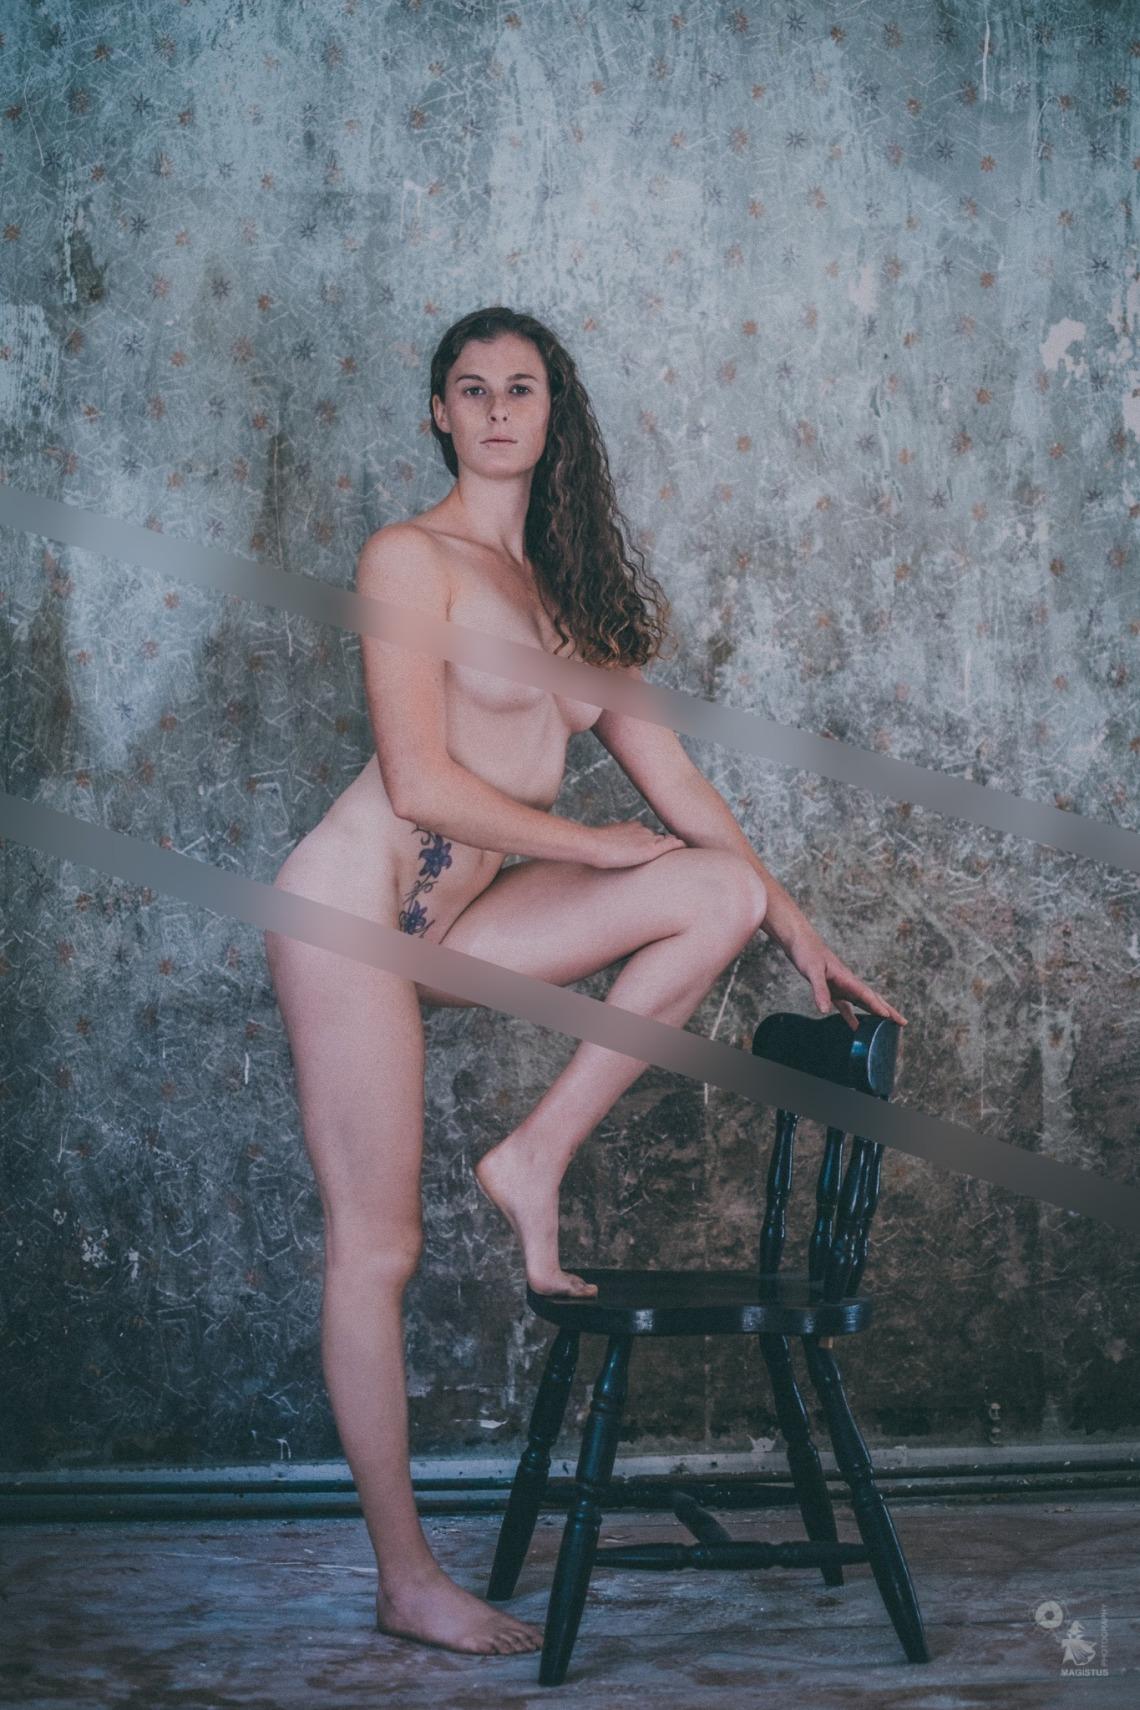 Nude art photo of a fantastic model posing naked